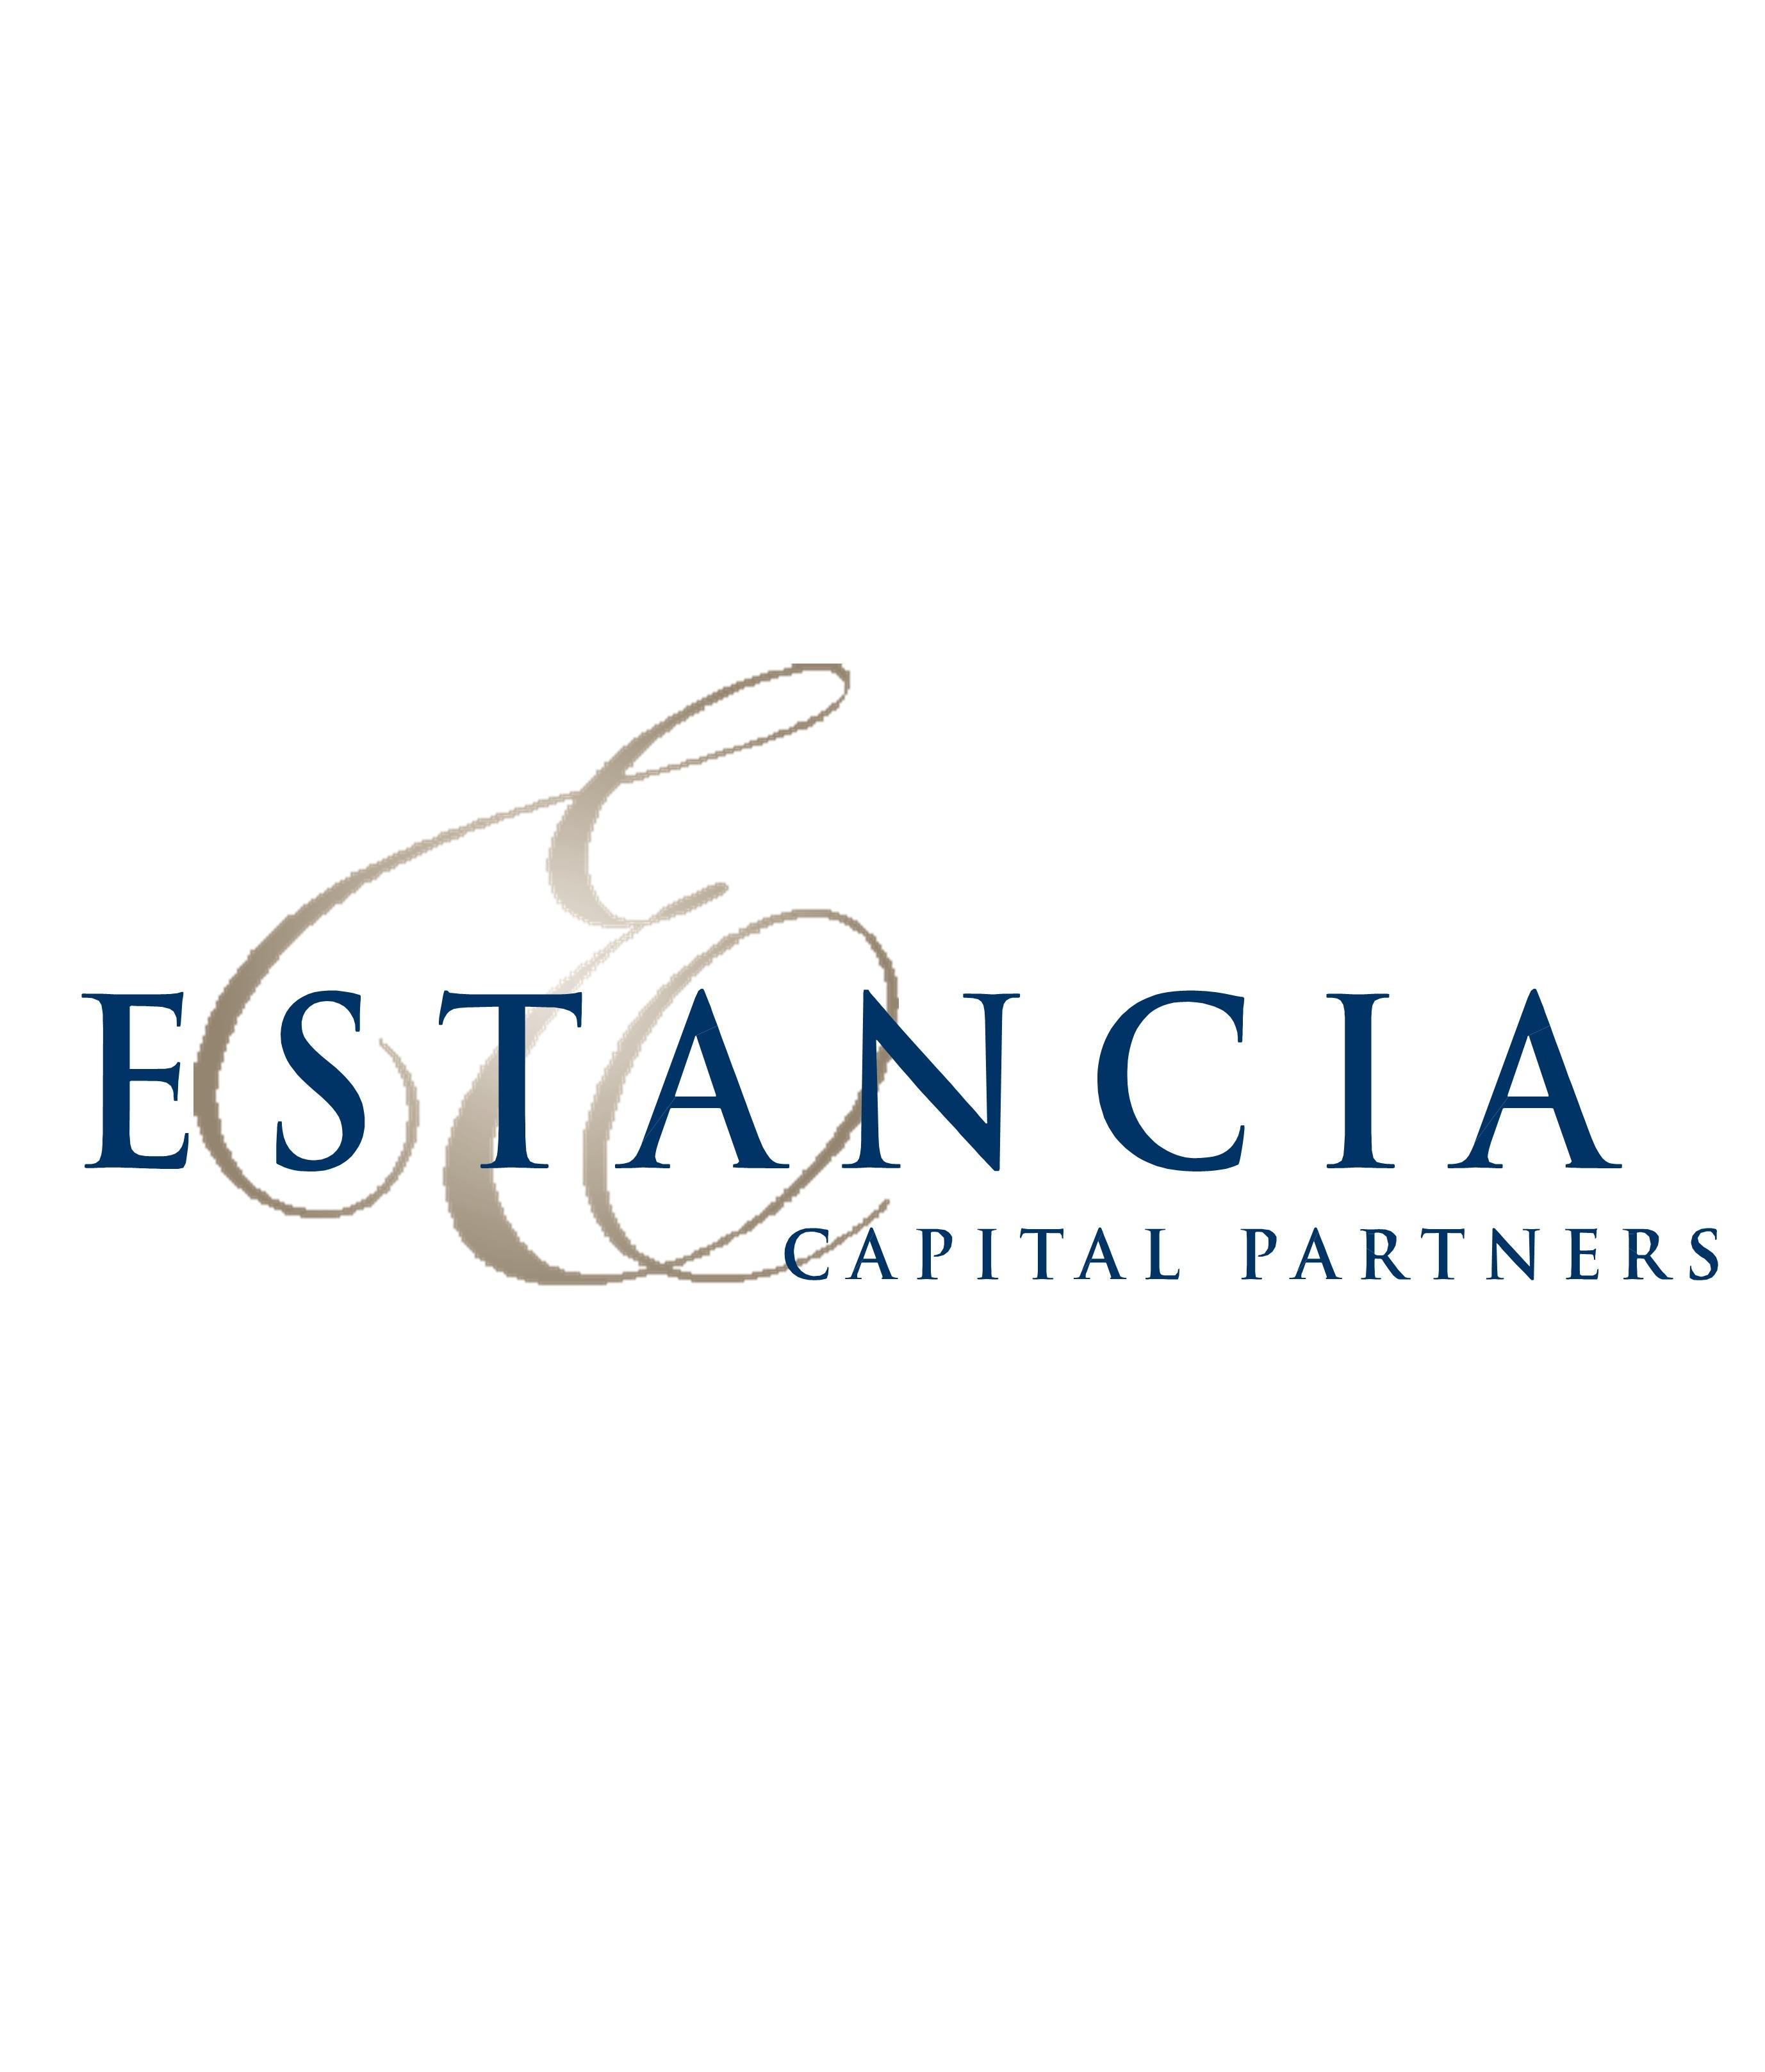 Estancia_Capital_Partners.jpg